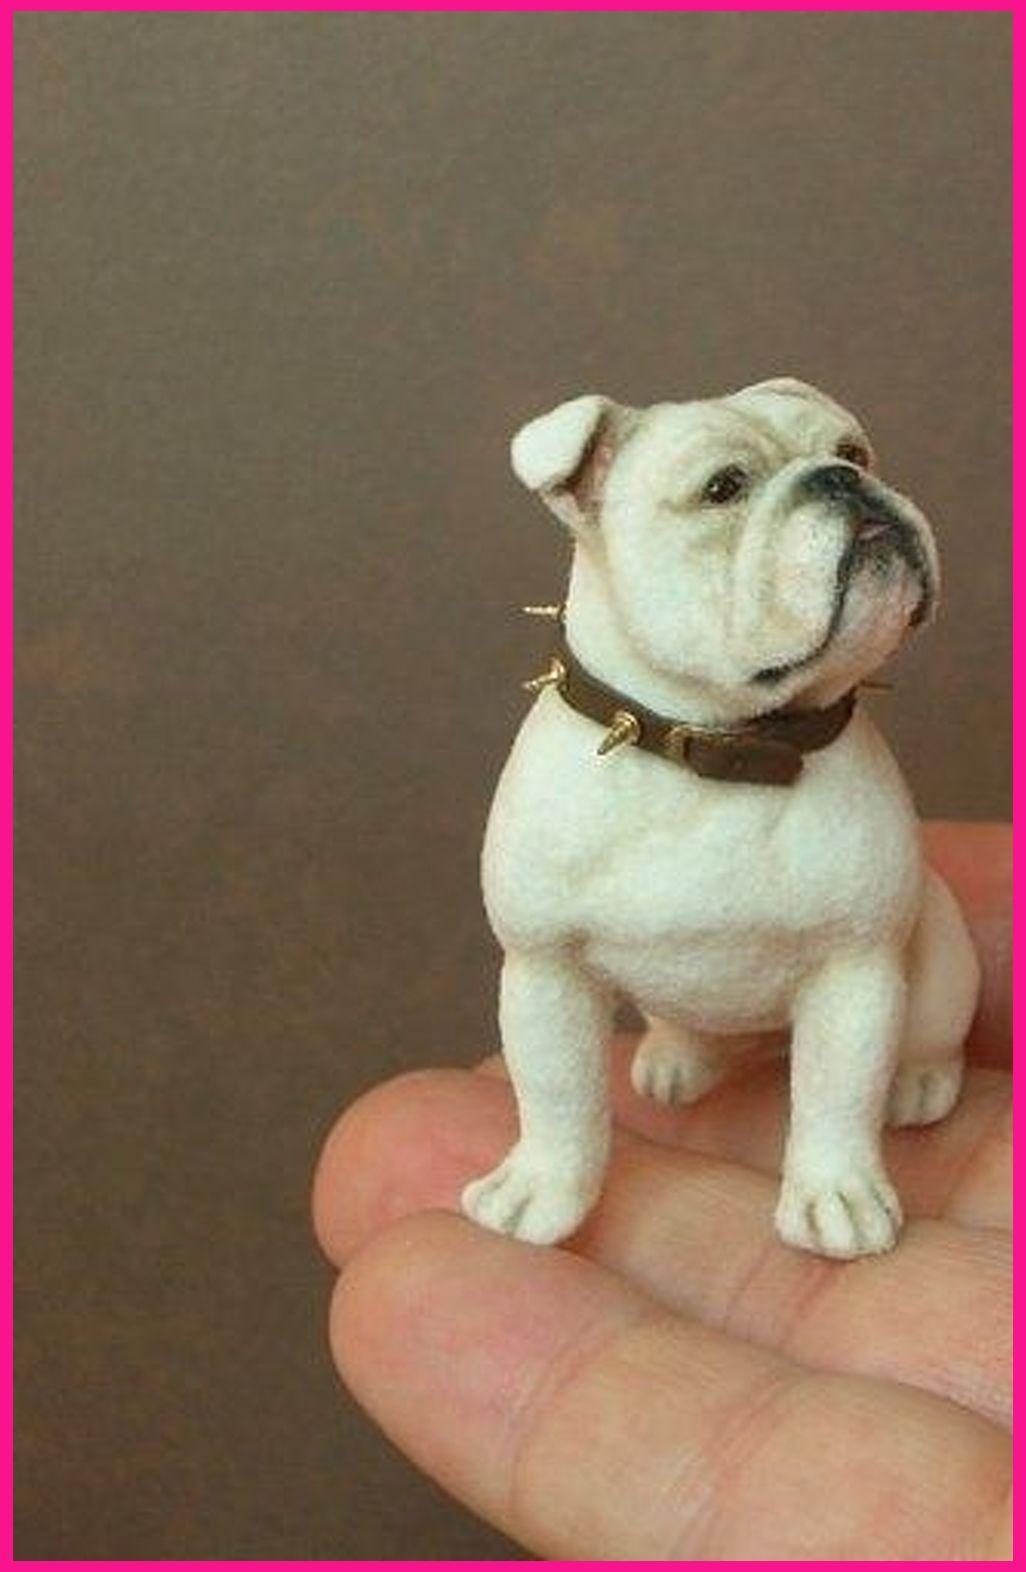 See More Concepts About French Bulldog Bulldog Puppies And French Bulldog Puppies Akita The Merle French Bulldog On Facebook Merle French Bull In 2020